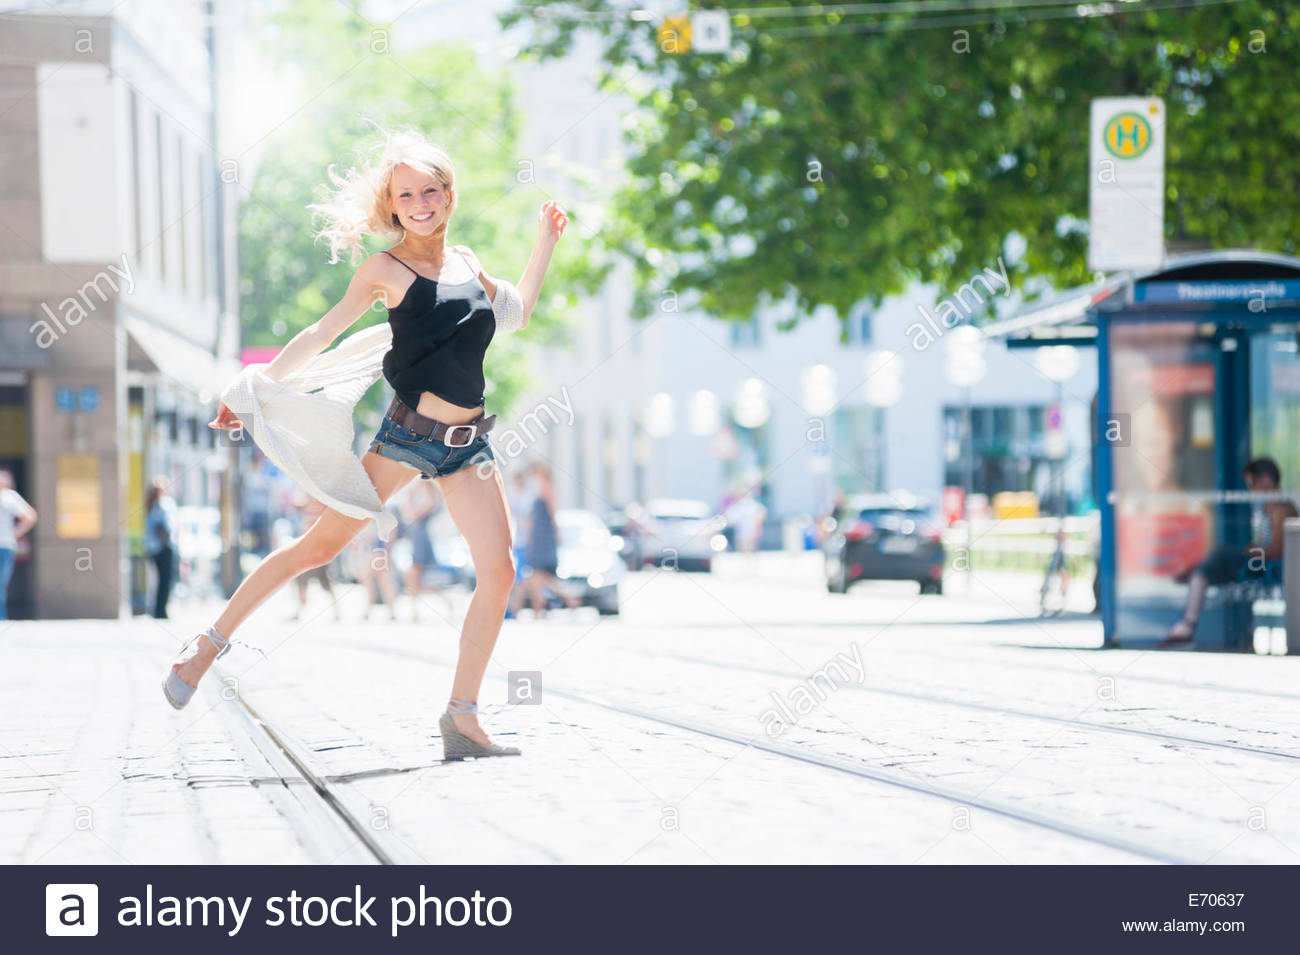 Selbstbewusste junge Frau tanzen auf Stadtstraße Stockbild